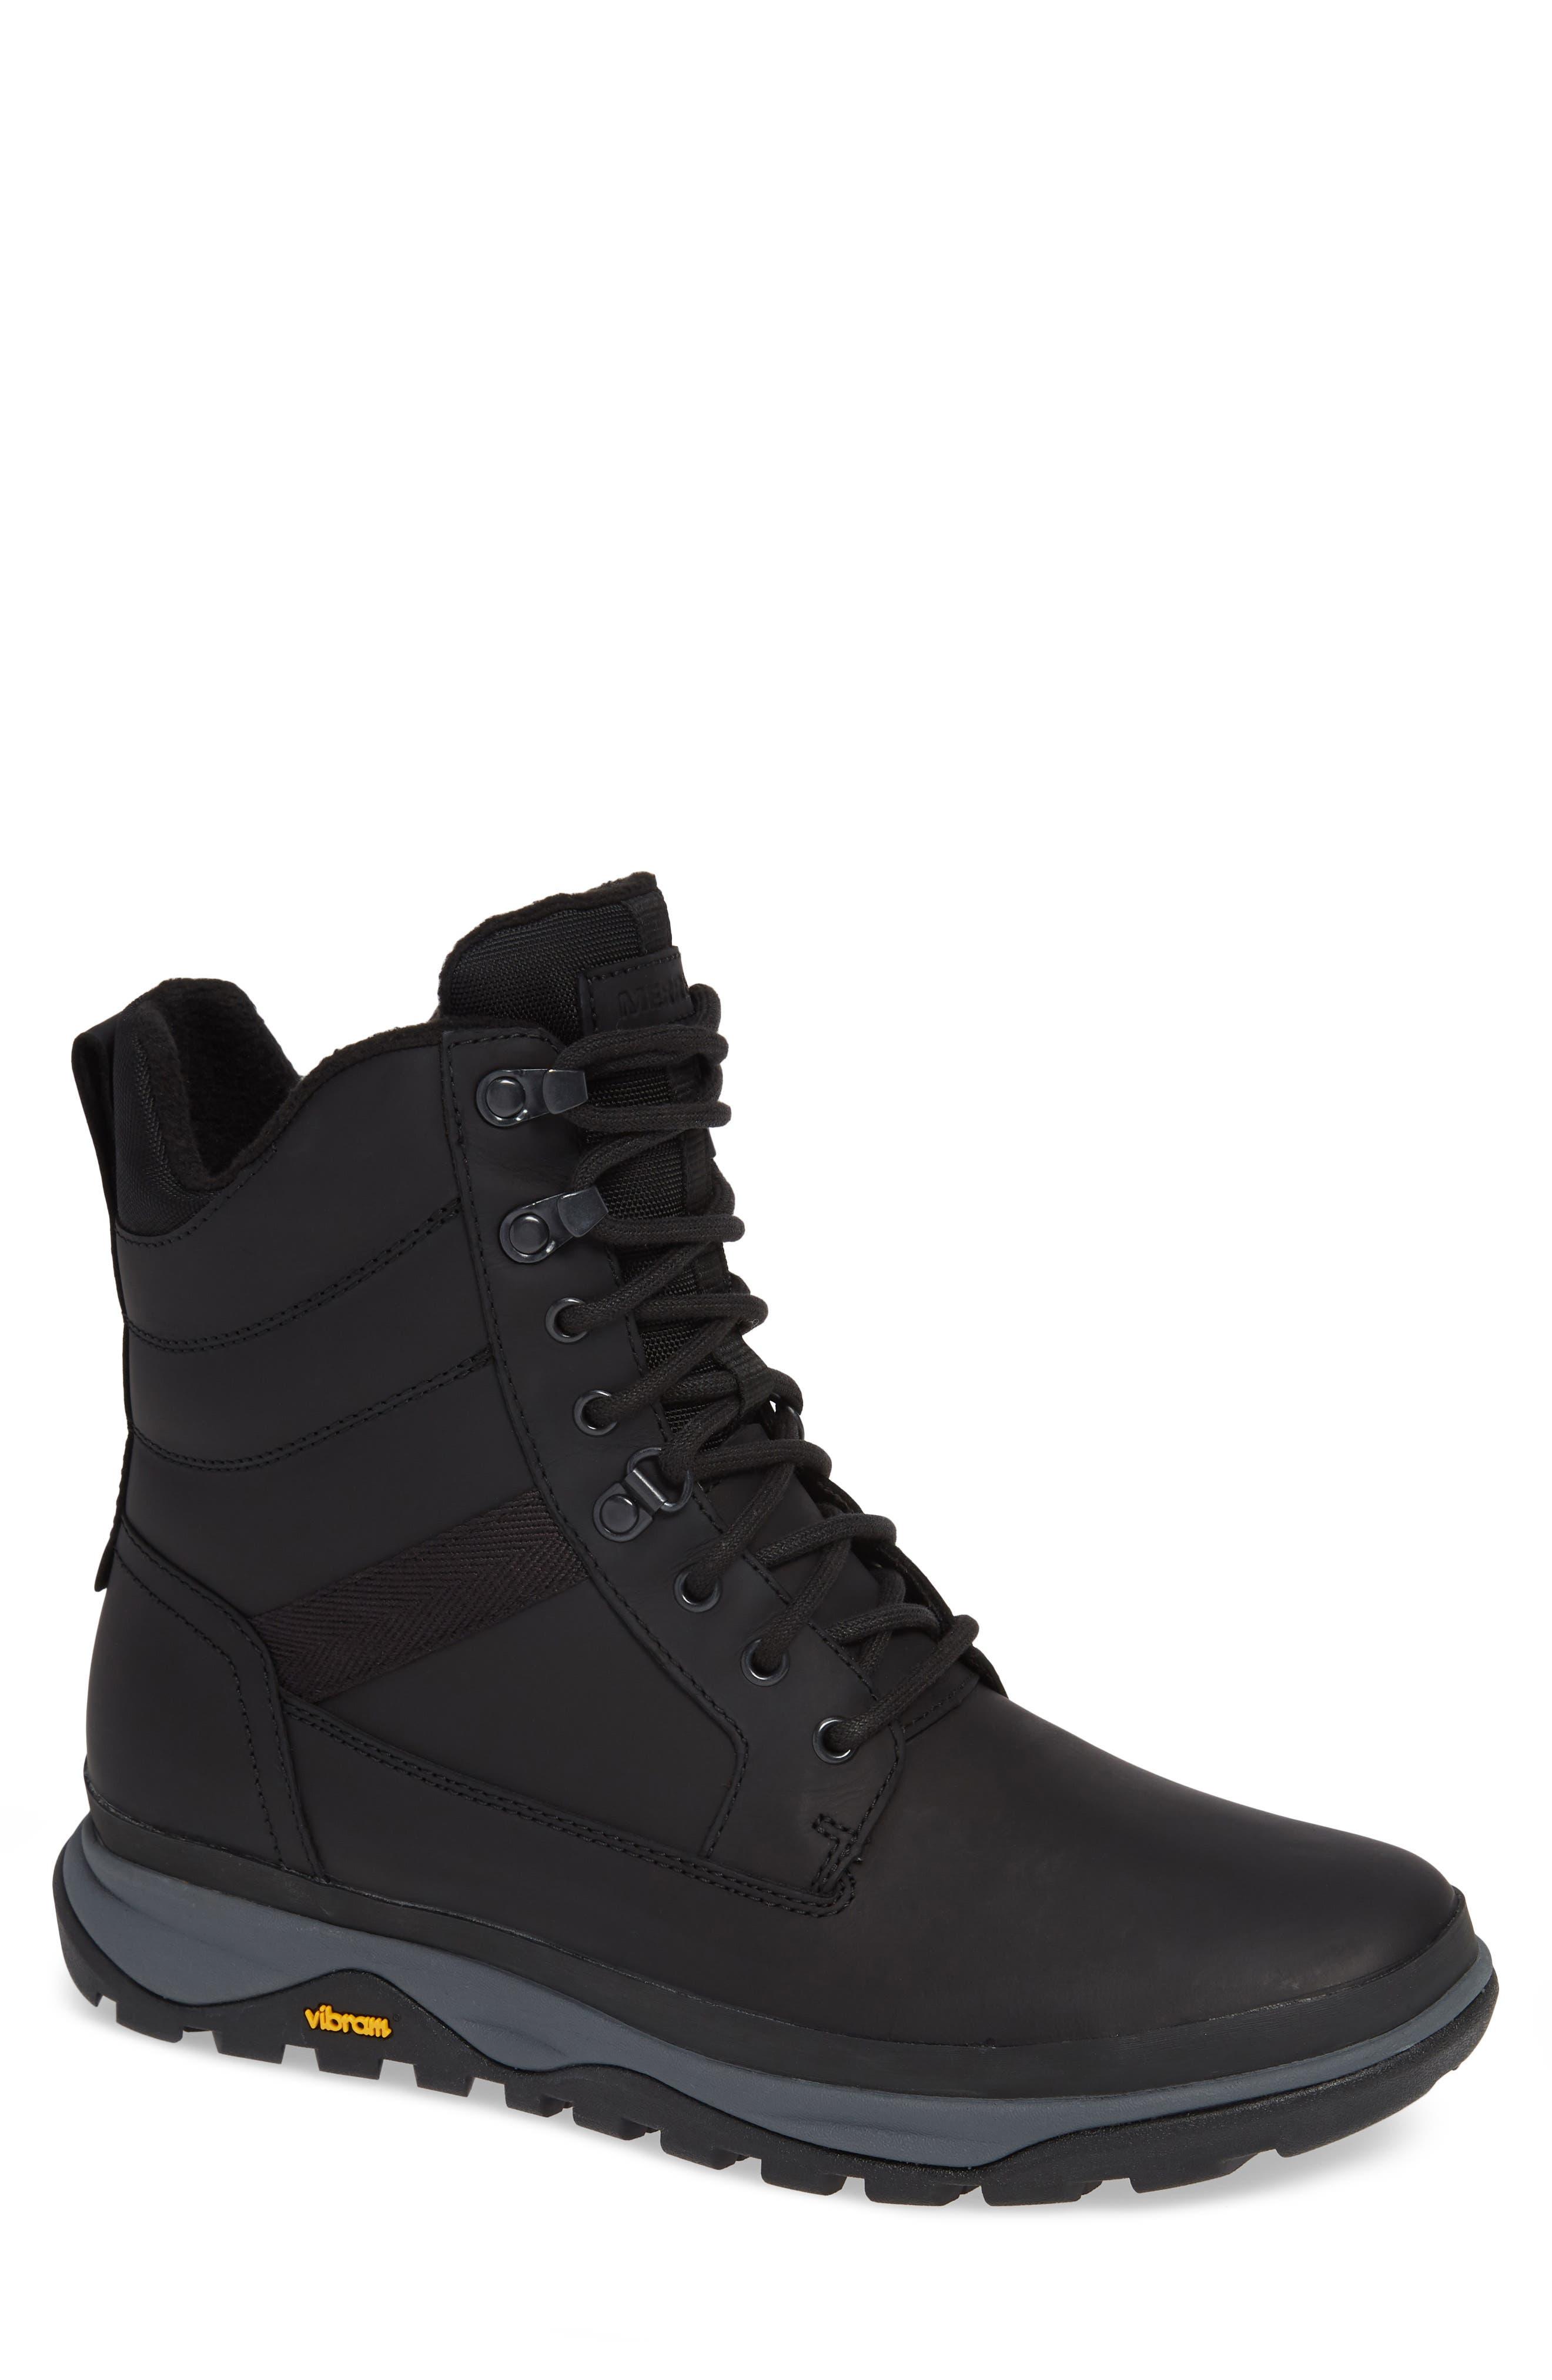 Merrell Tremblant Insulated Waterproof Boot, Black